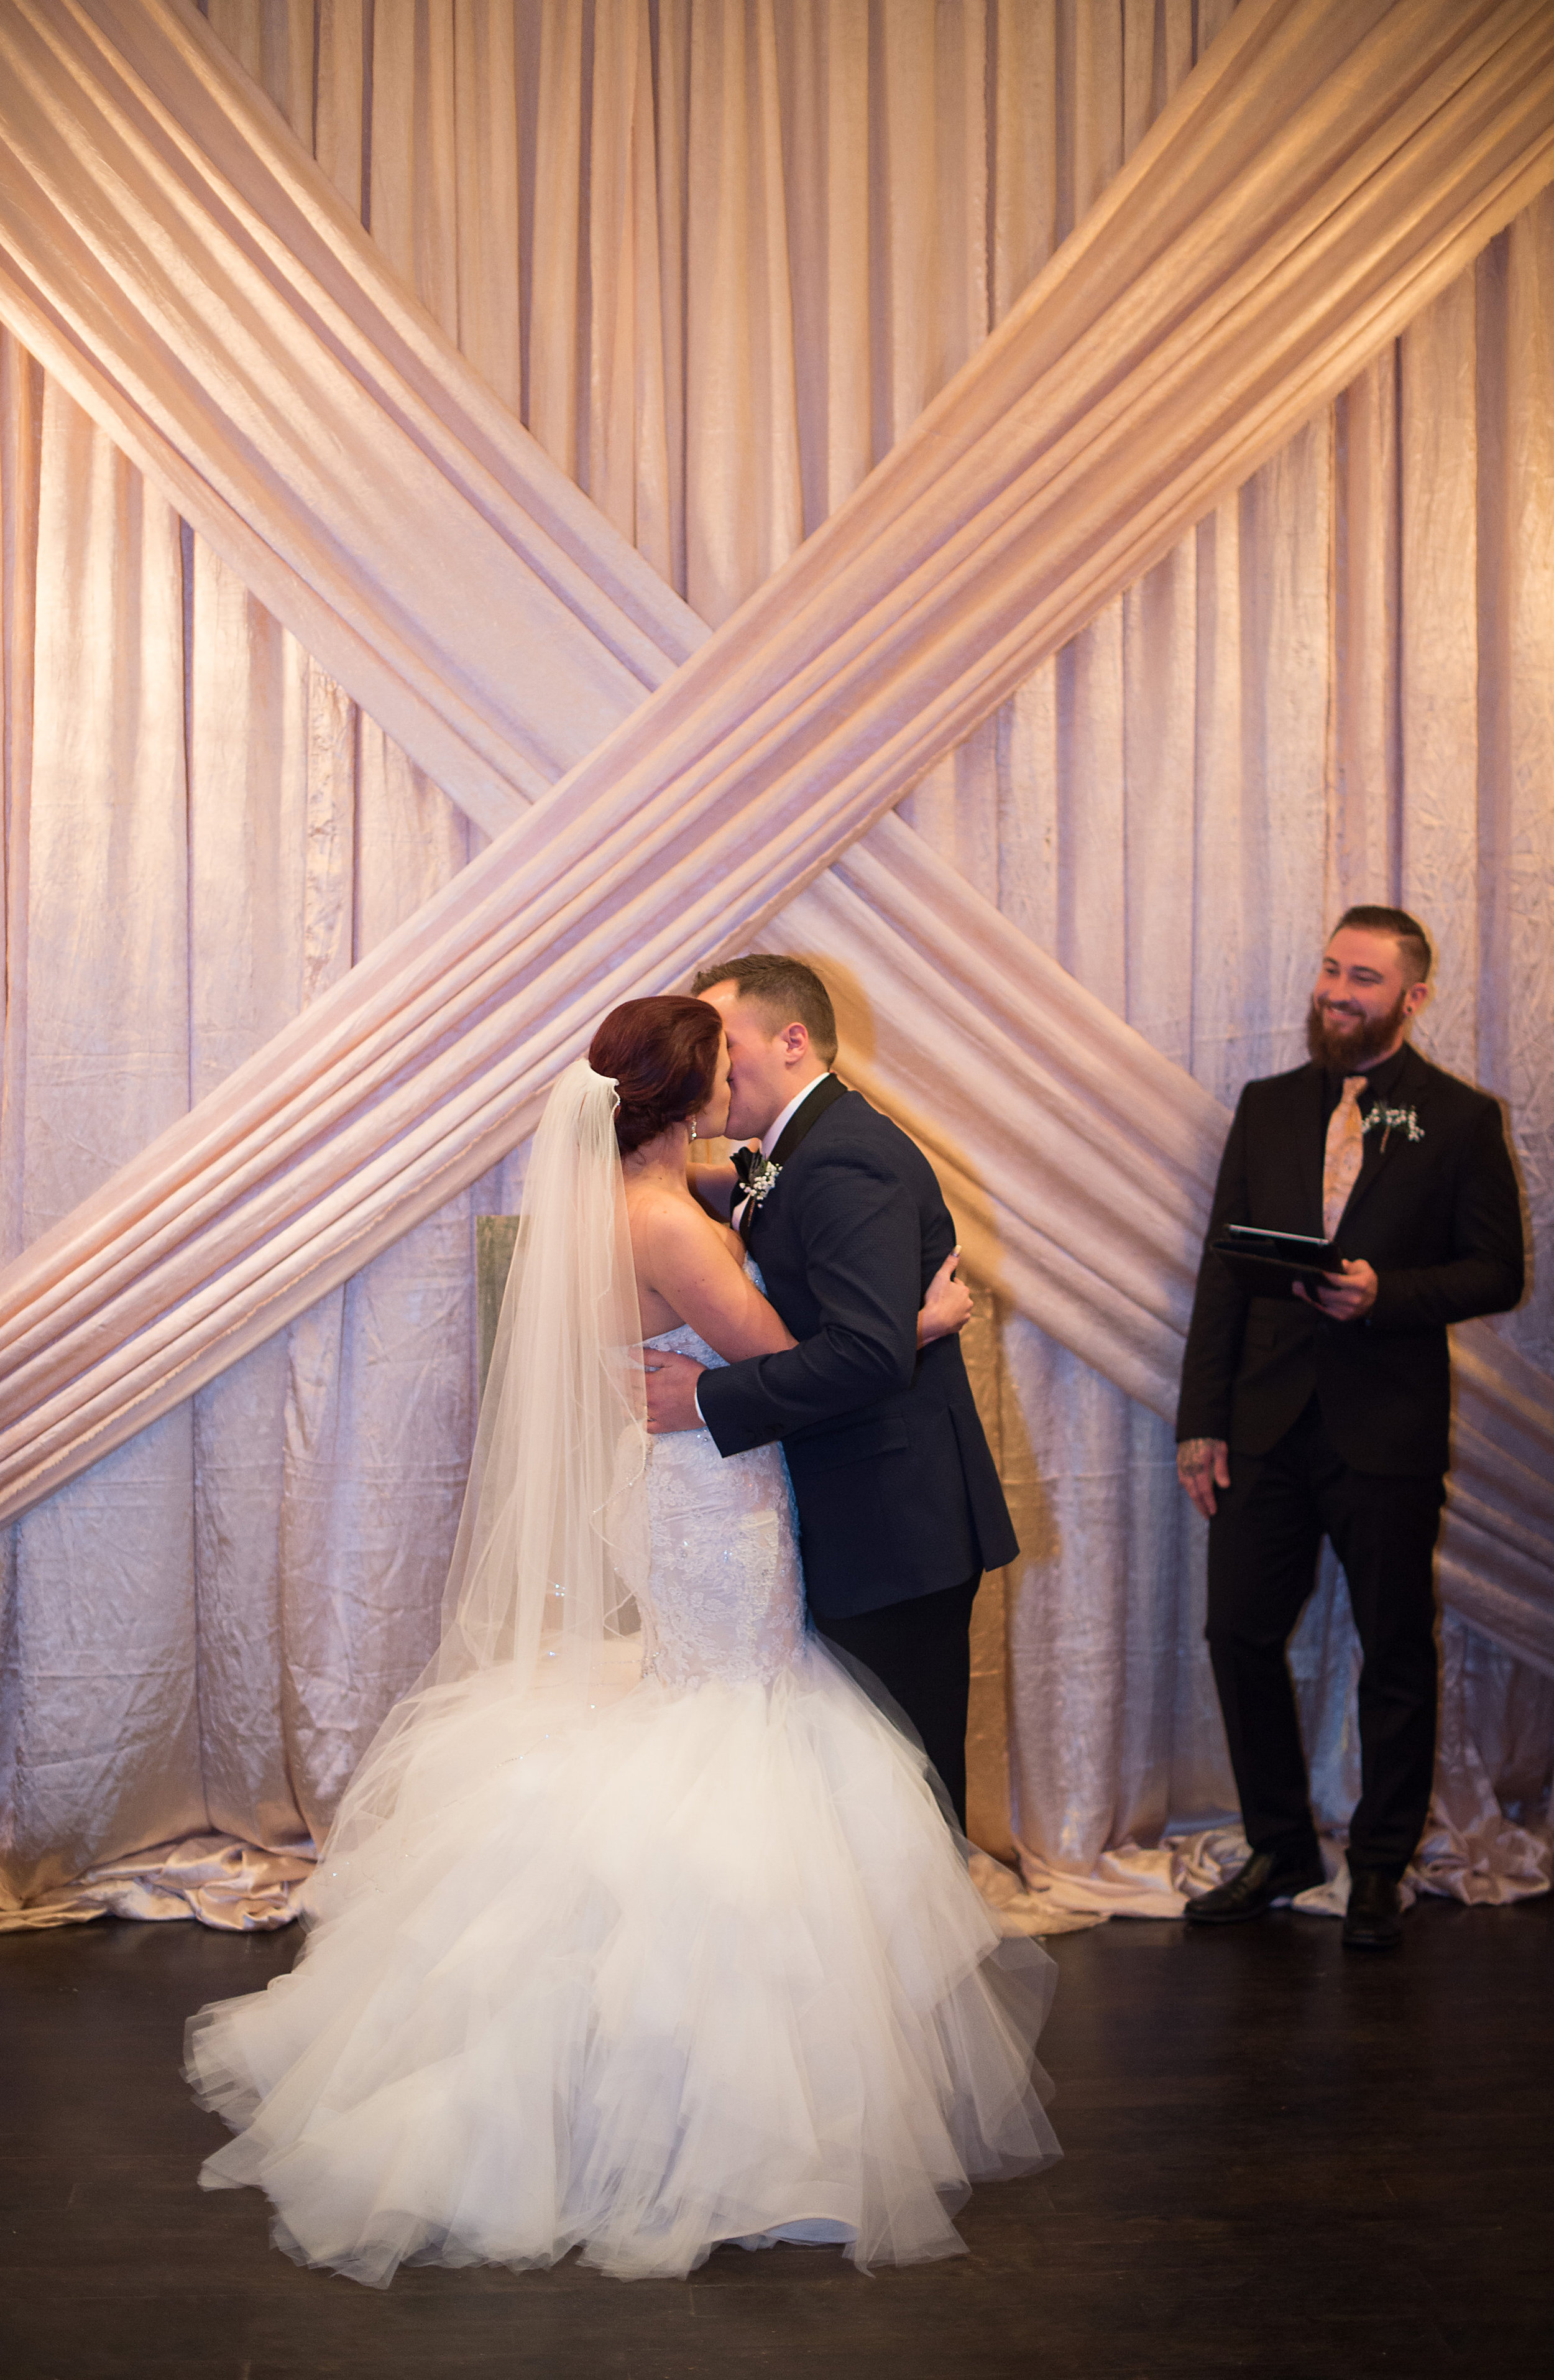 Danielle Cameron s Wedding-3 The Ceremony-0114.jpg